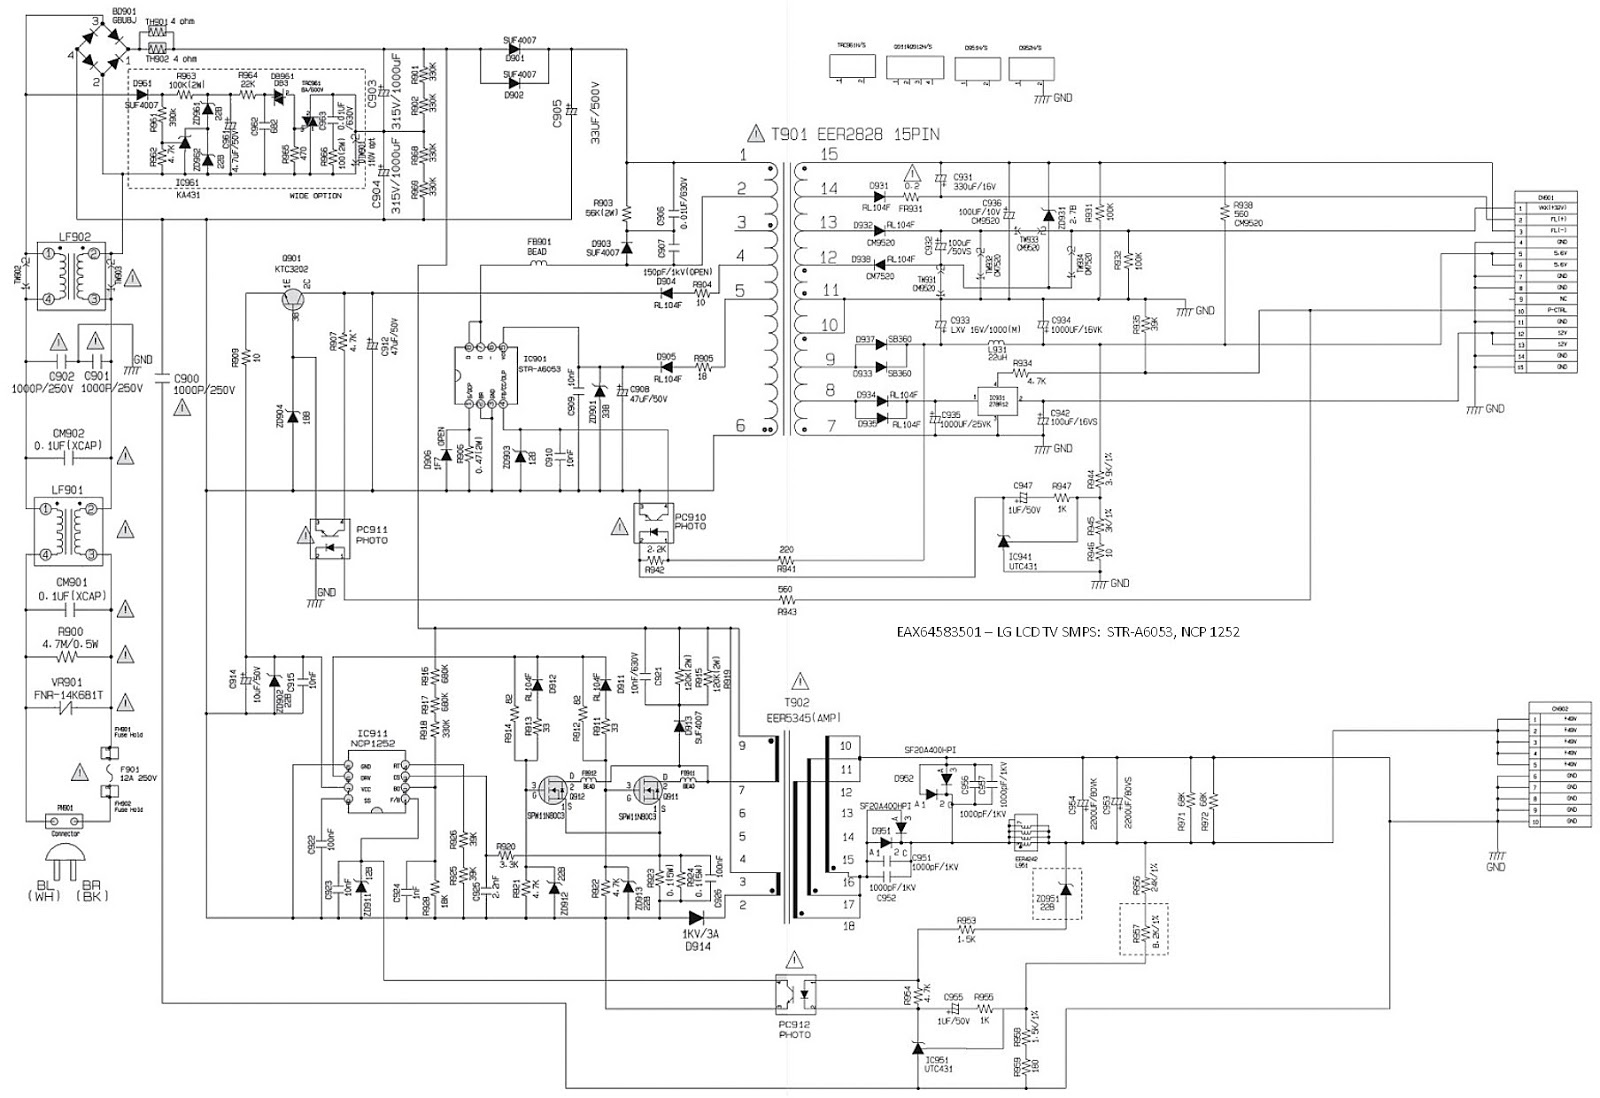 medium resolution of eax64583501 lg lcd tv smps schematic schematic diagrams lg led tv smps circuit diagram lg led